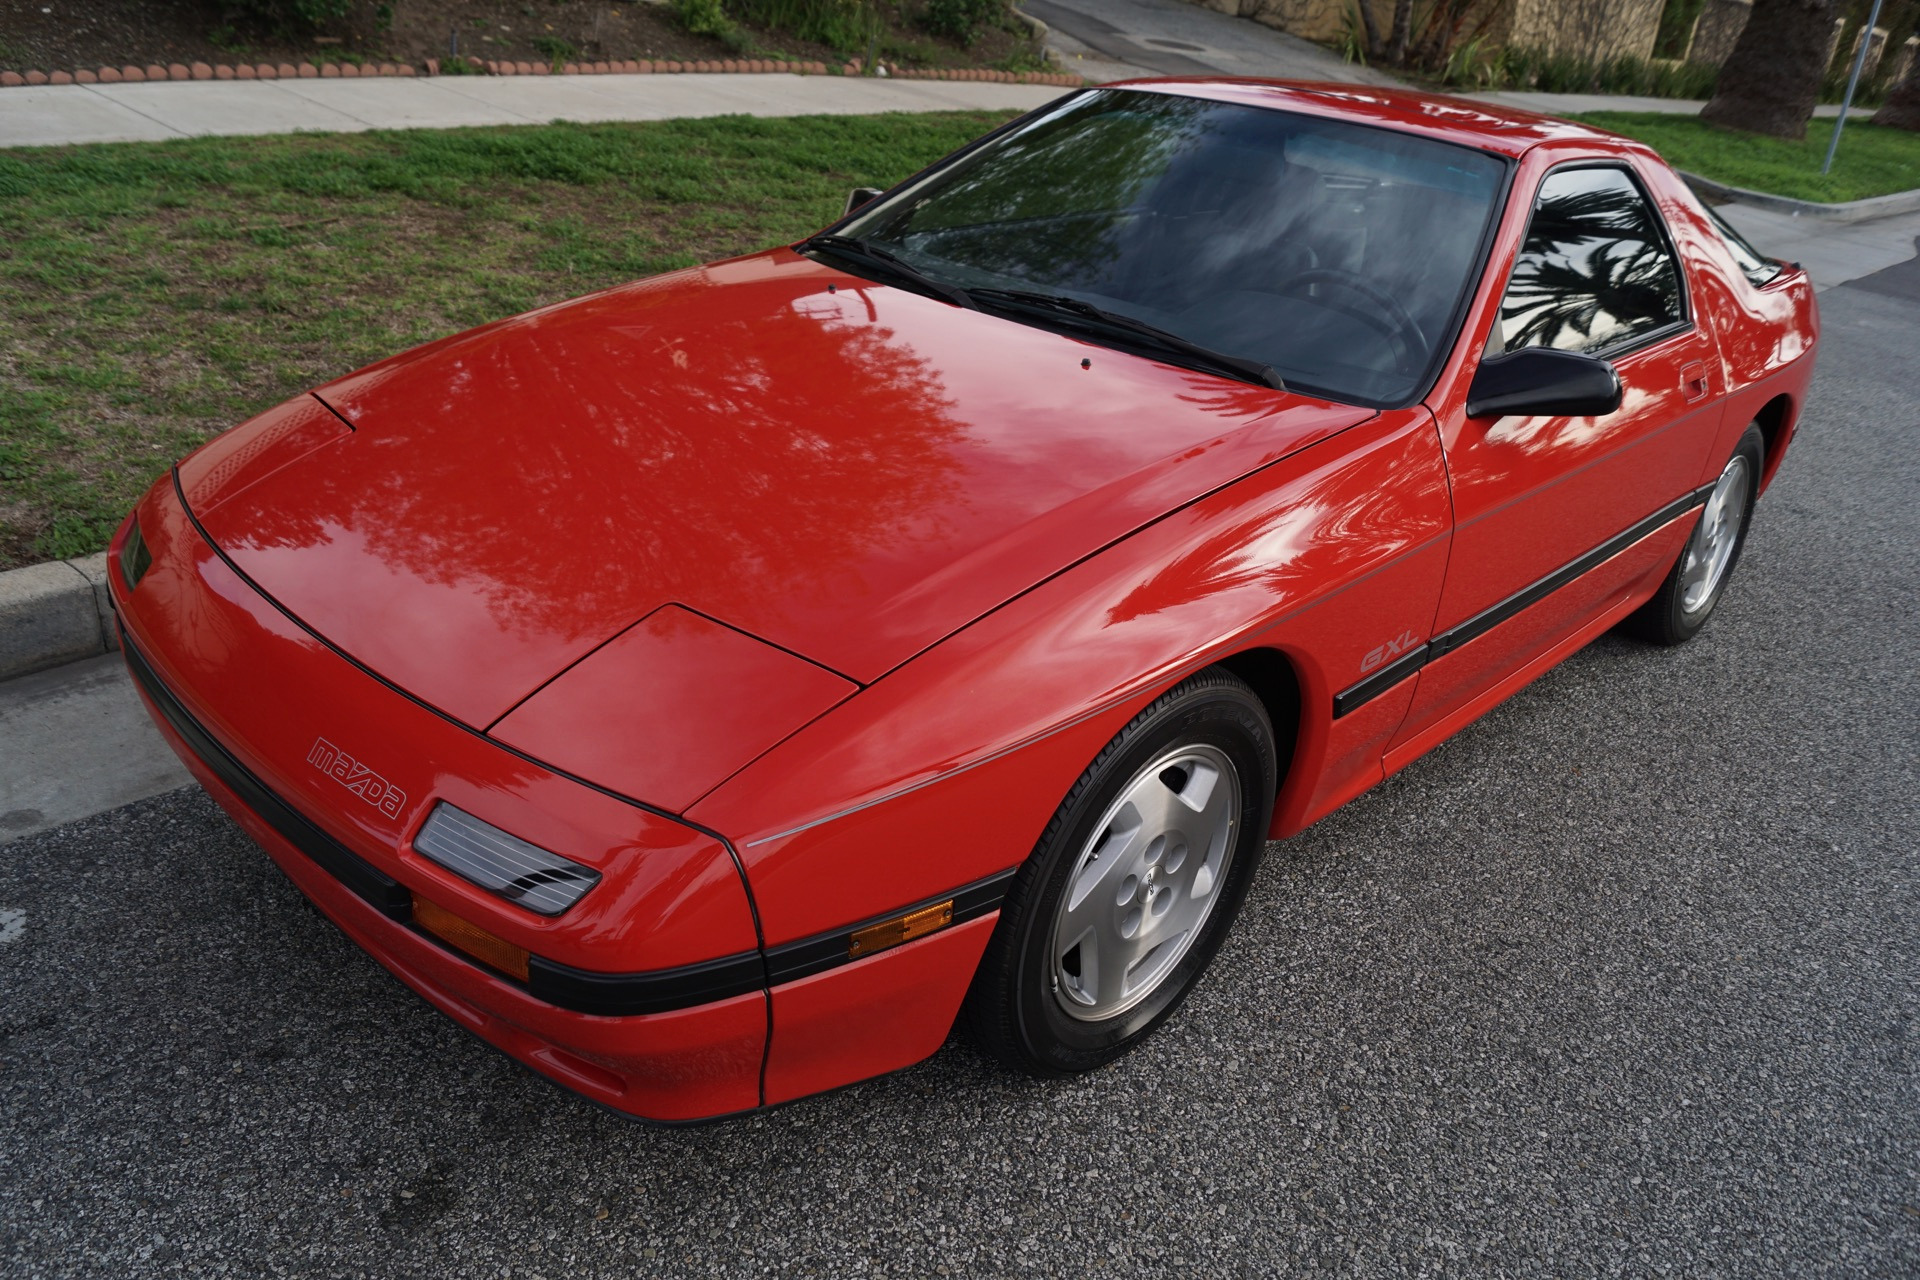 California Classic Car Dealer | Classic Auto Cars For Sale | West ...